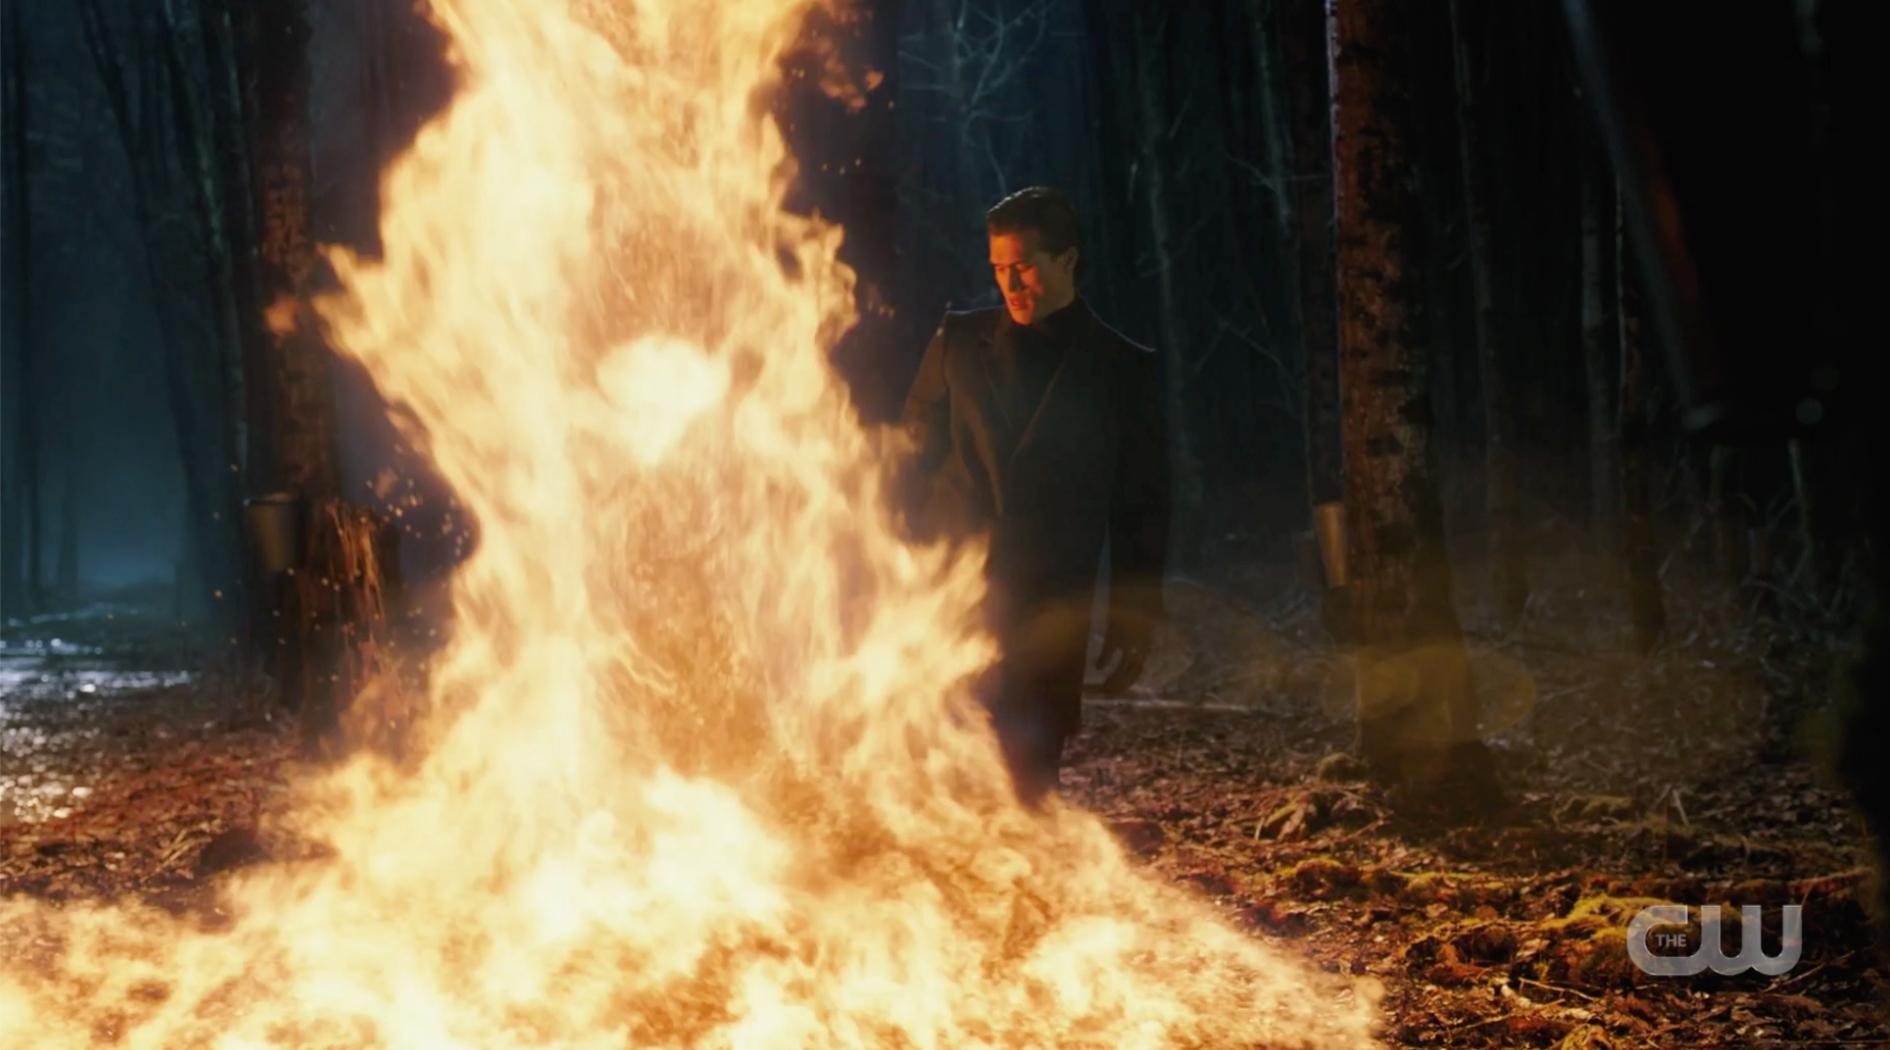 Reggie lighting the maple on fire